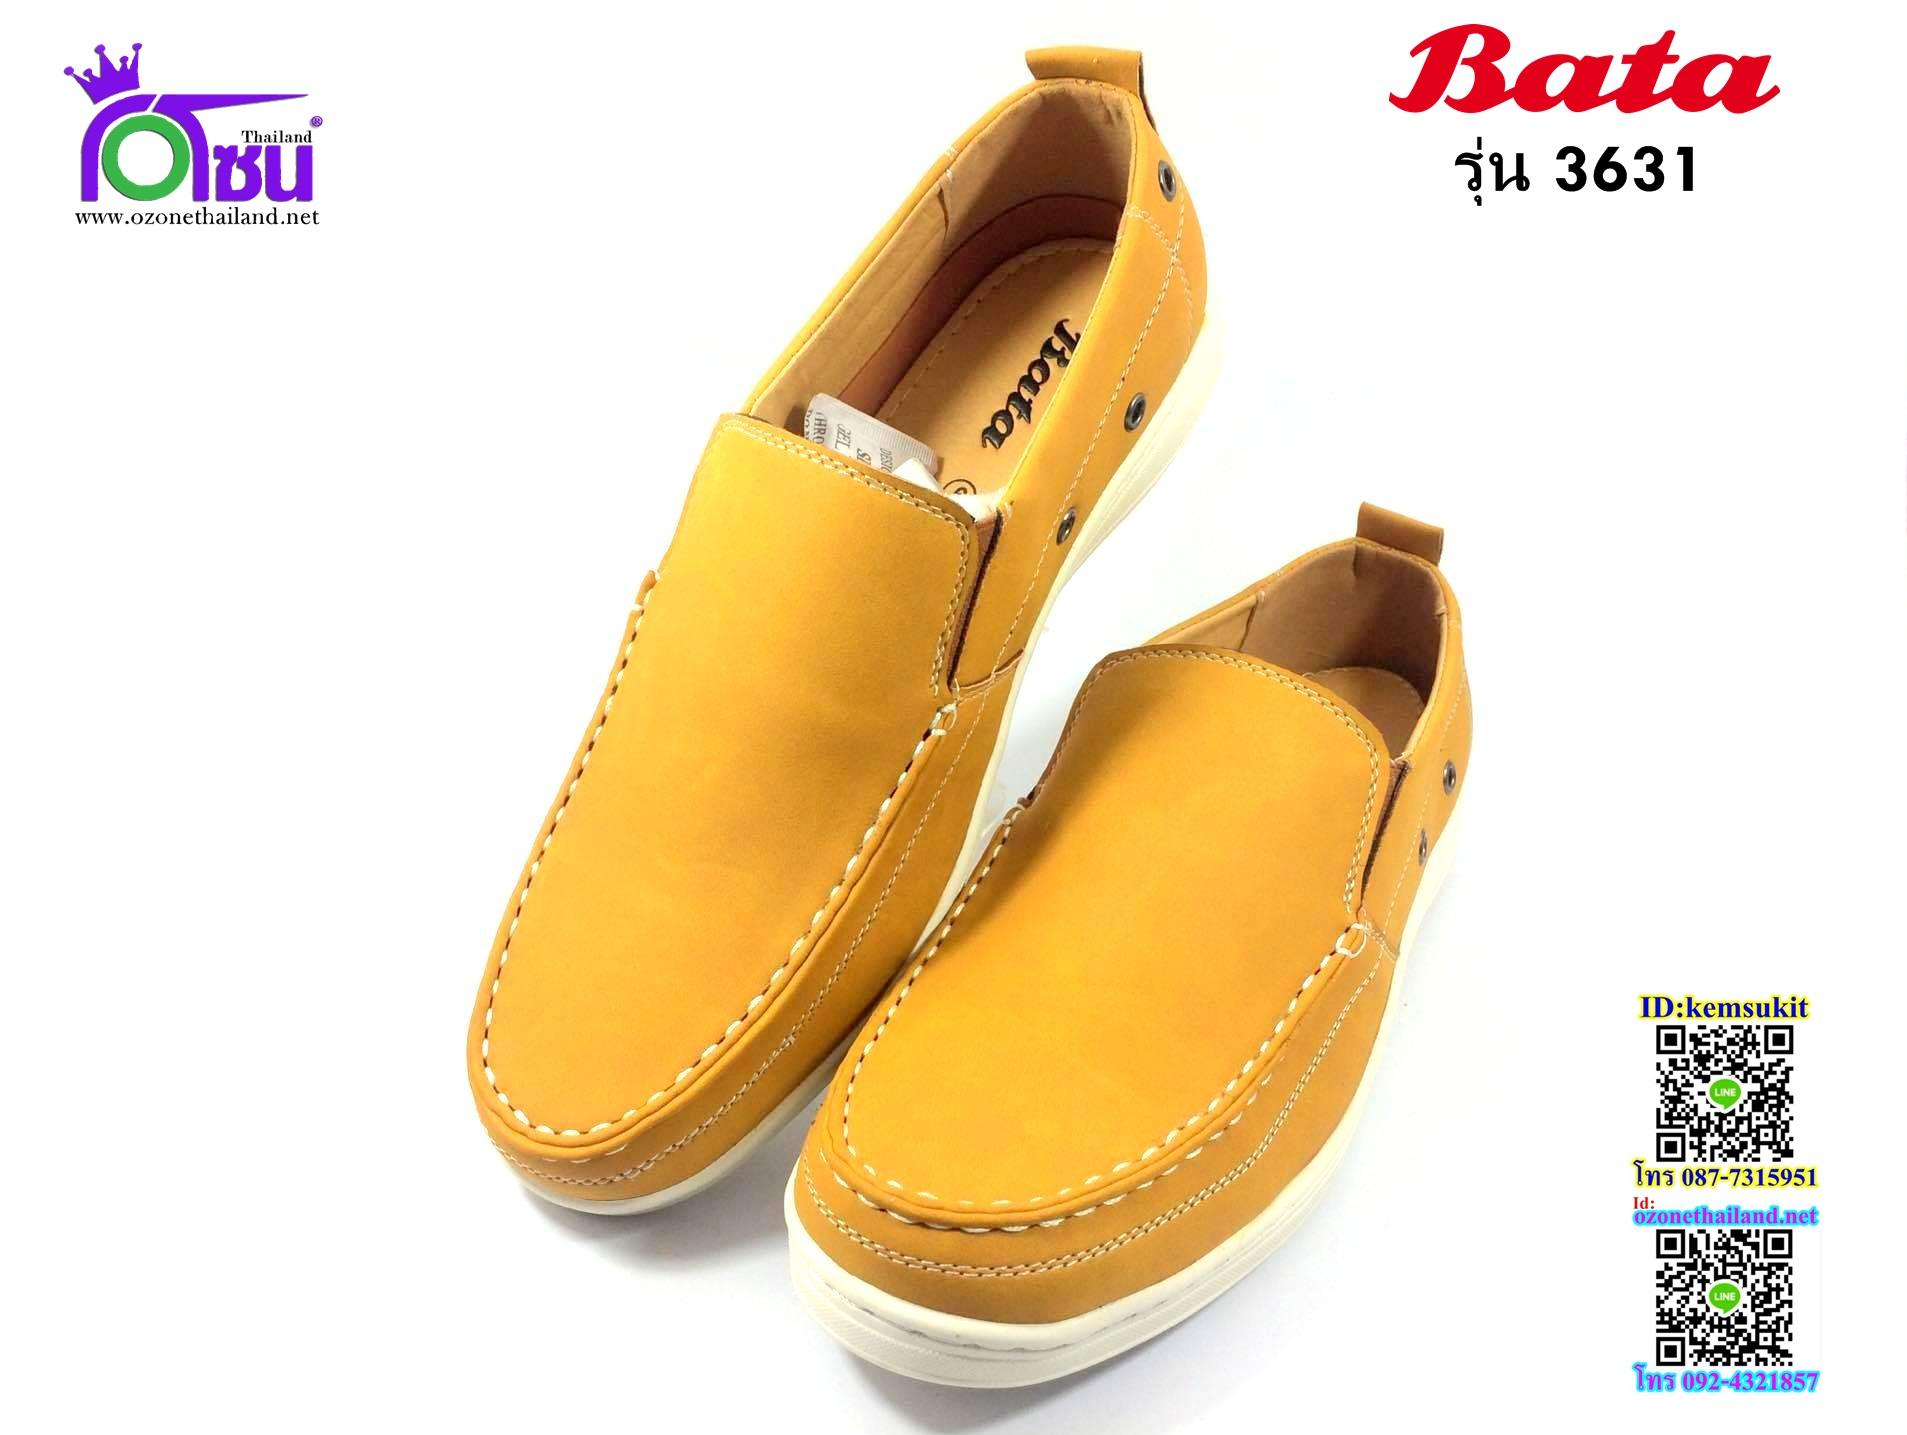 Bata (บาจา) สีเหลืองแทน รุ่น8230 เบอร์39-45